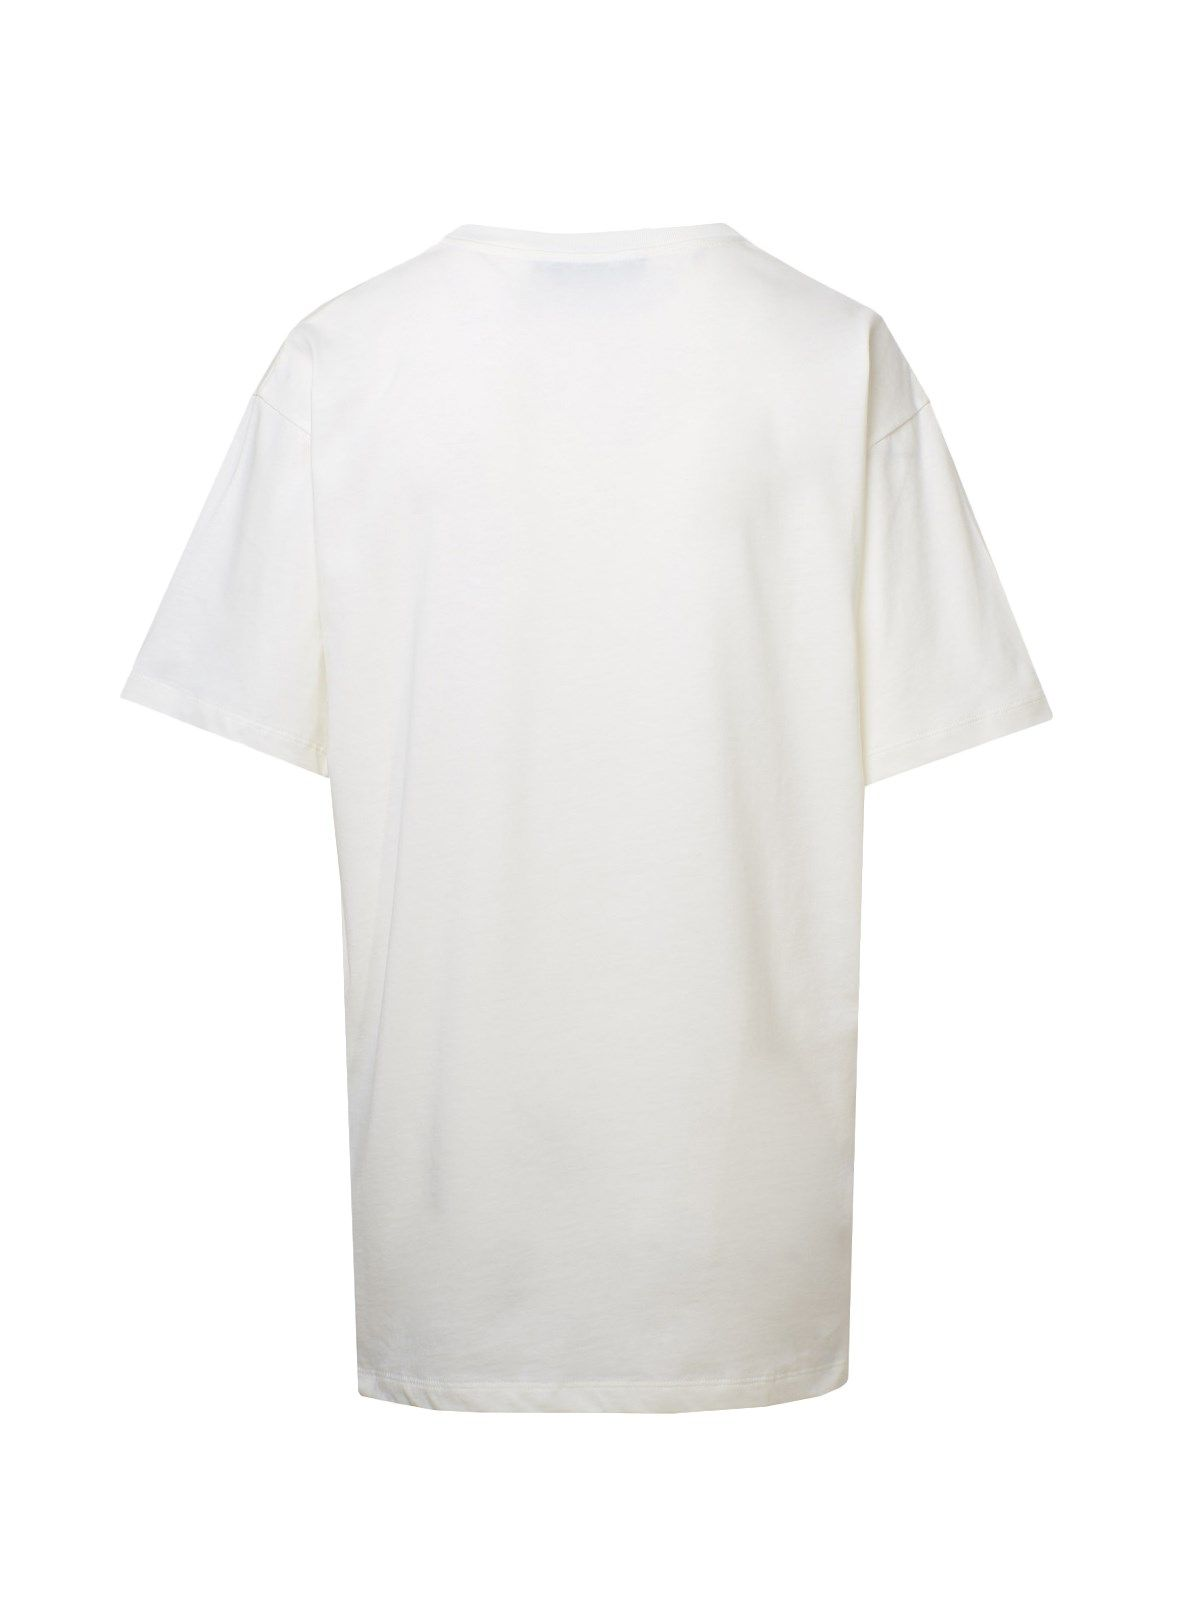 GUCCI Cottons GUCCI WOMEN'S WHITE COTTON T-SHIRT